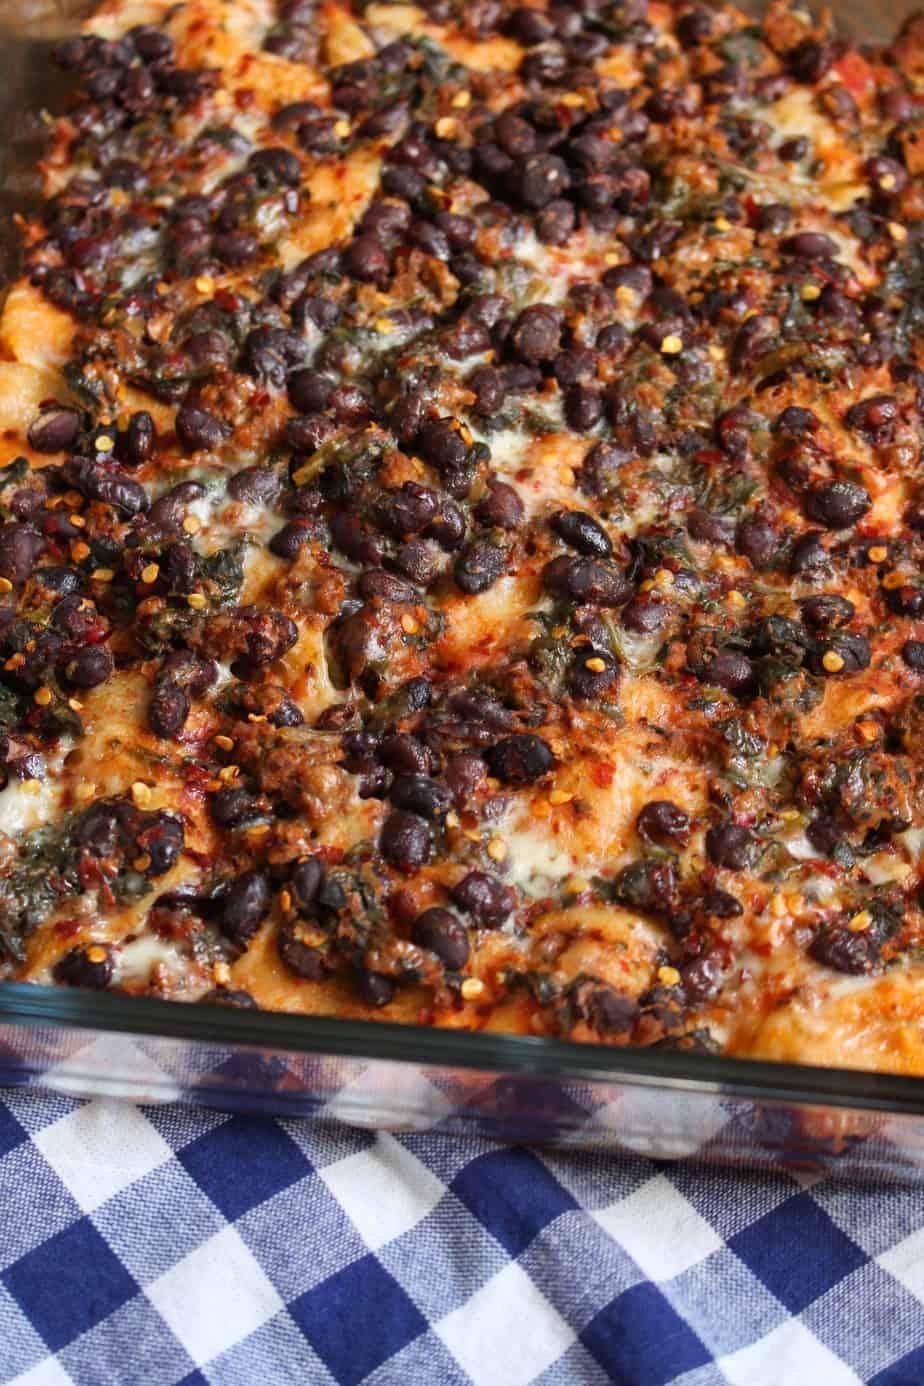 6-Ingredient Taco Lasagna Casserole | Frugal Nutrition